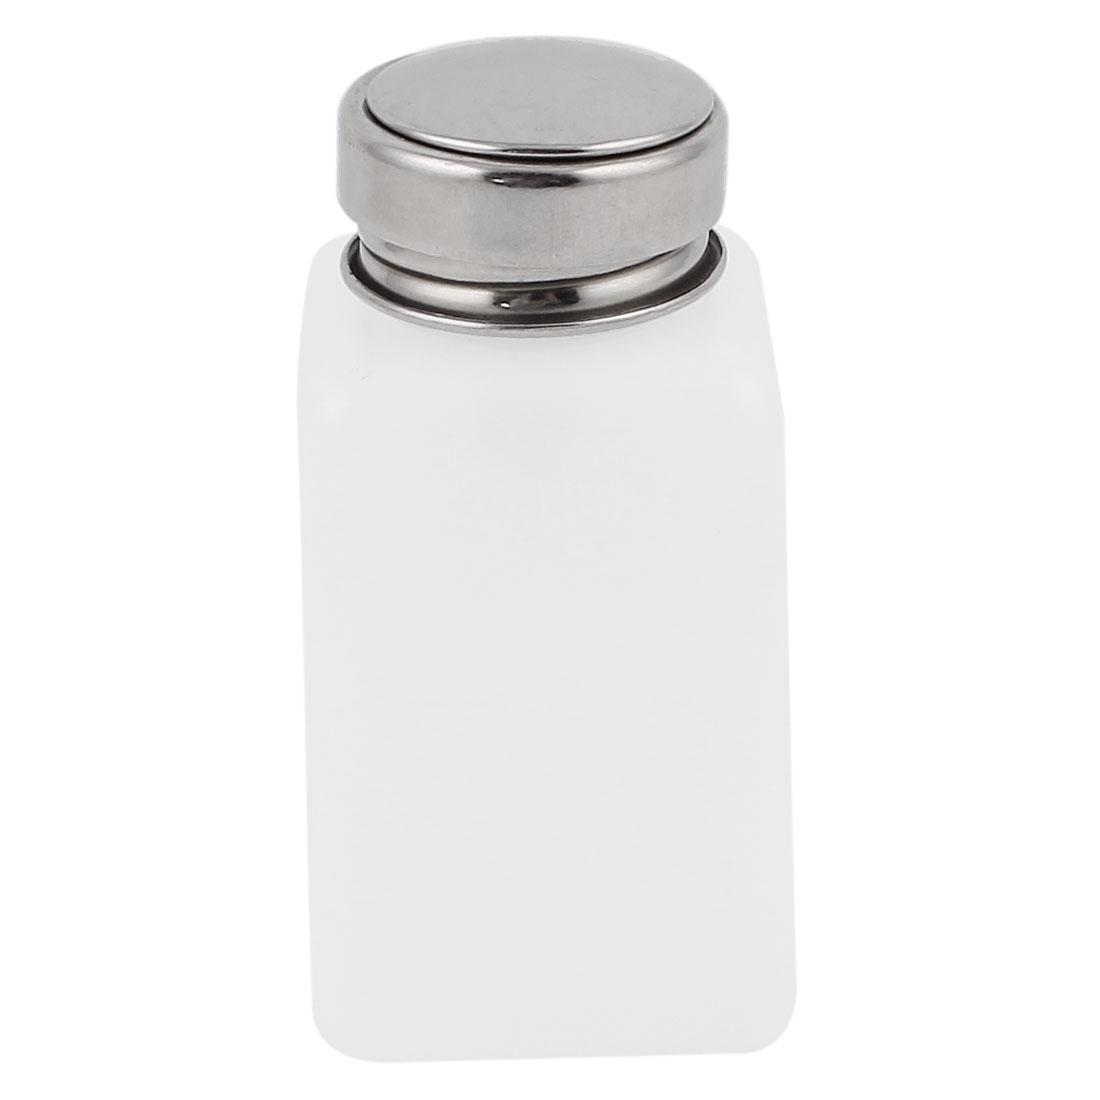 180ml Nail Polish Remover Liquid Alcohol Press Pumping Dispenser Bottle